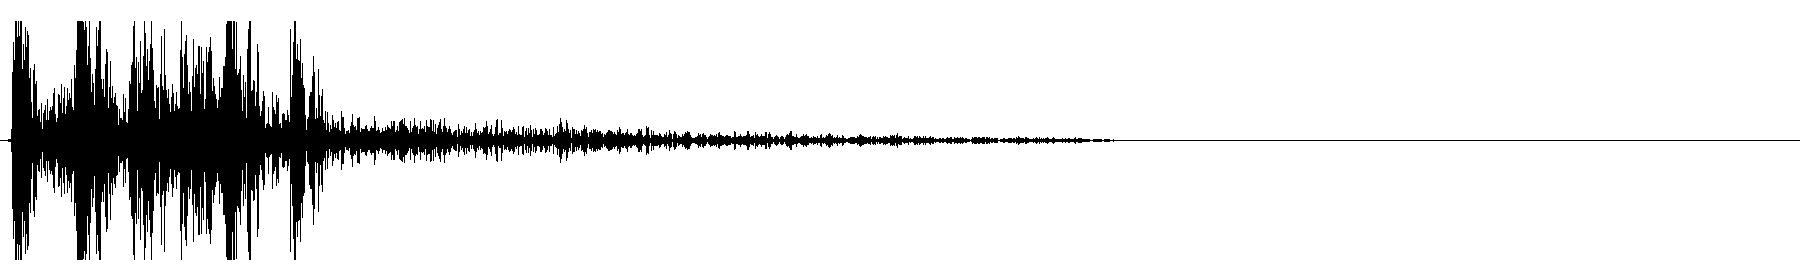 28 clp04